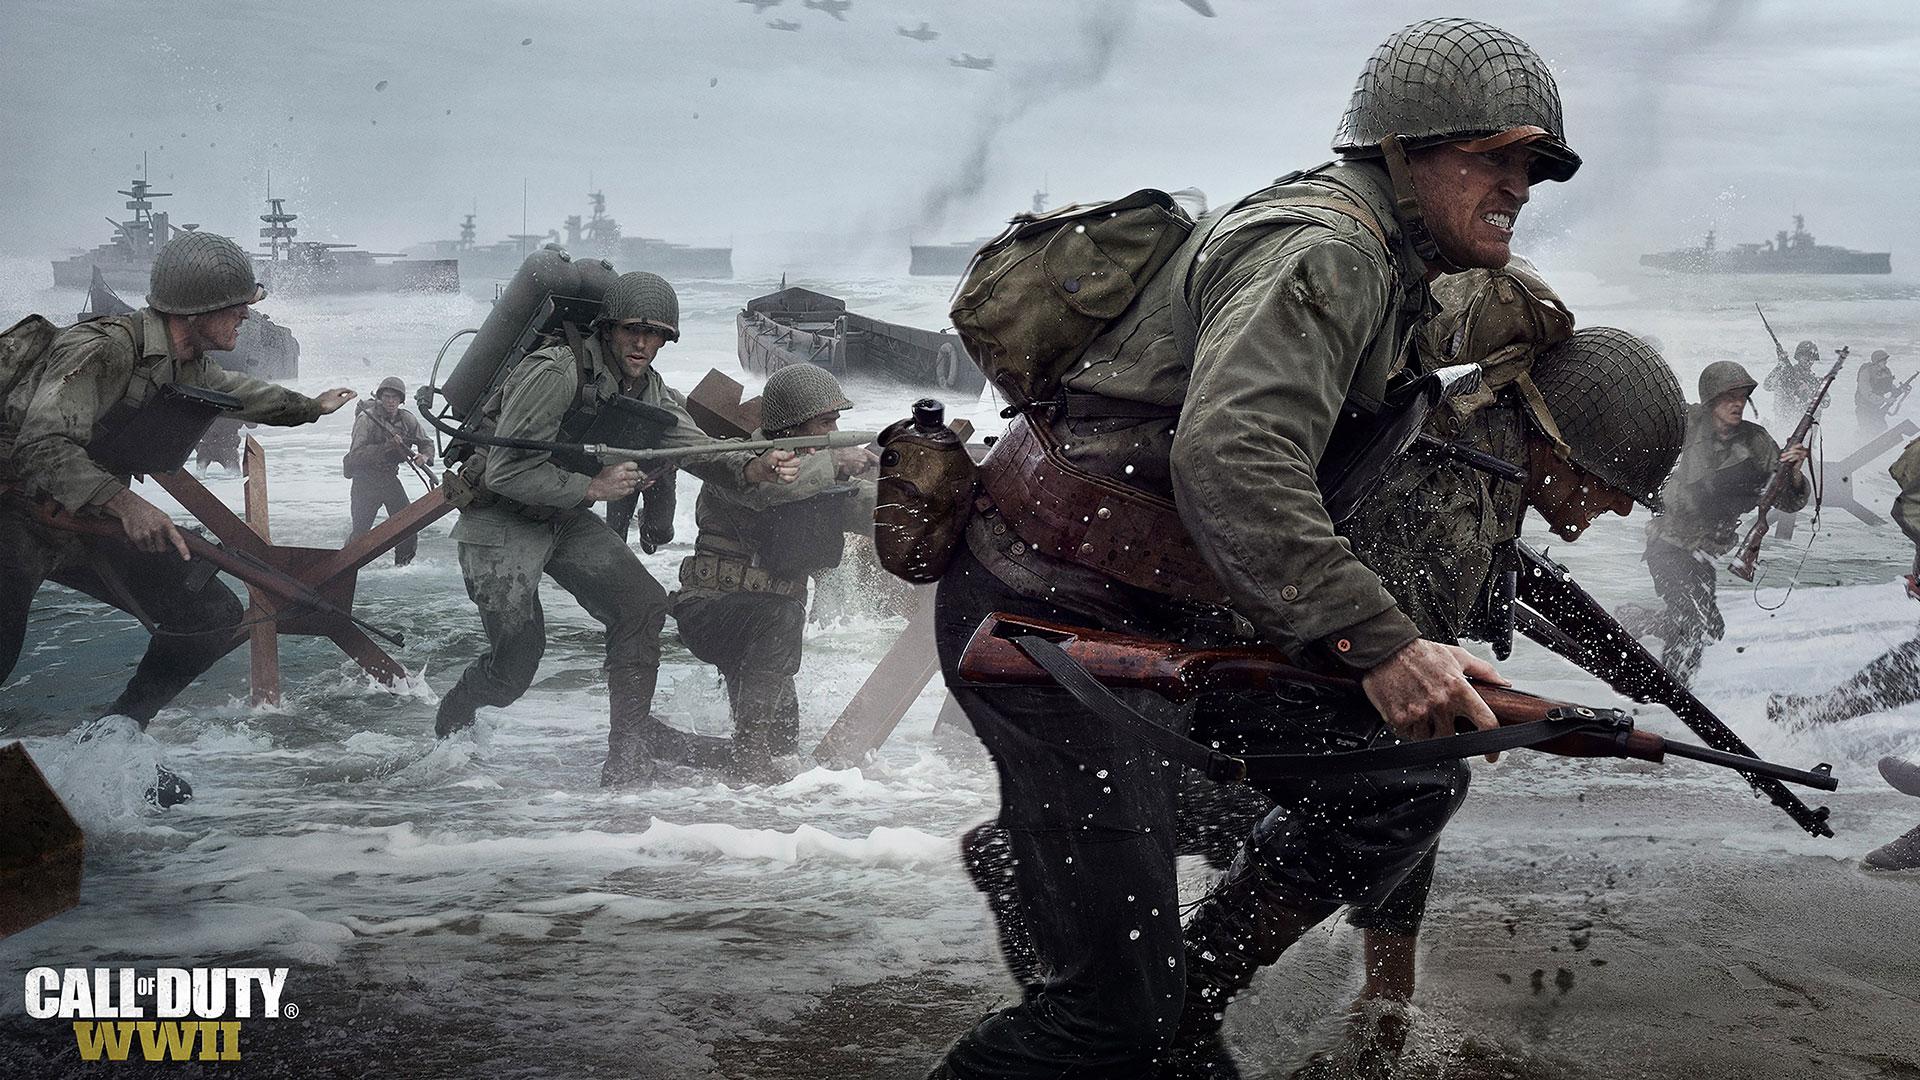 CALL-OF-DUTY-WWII-1080P-Wallpaper-3.jpg